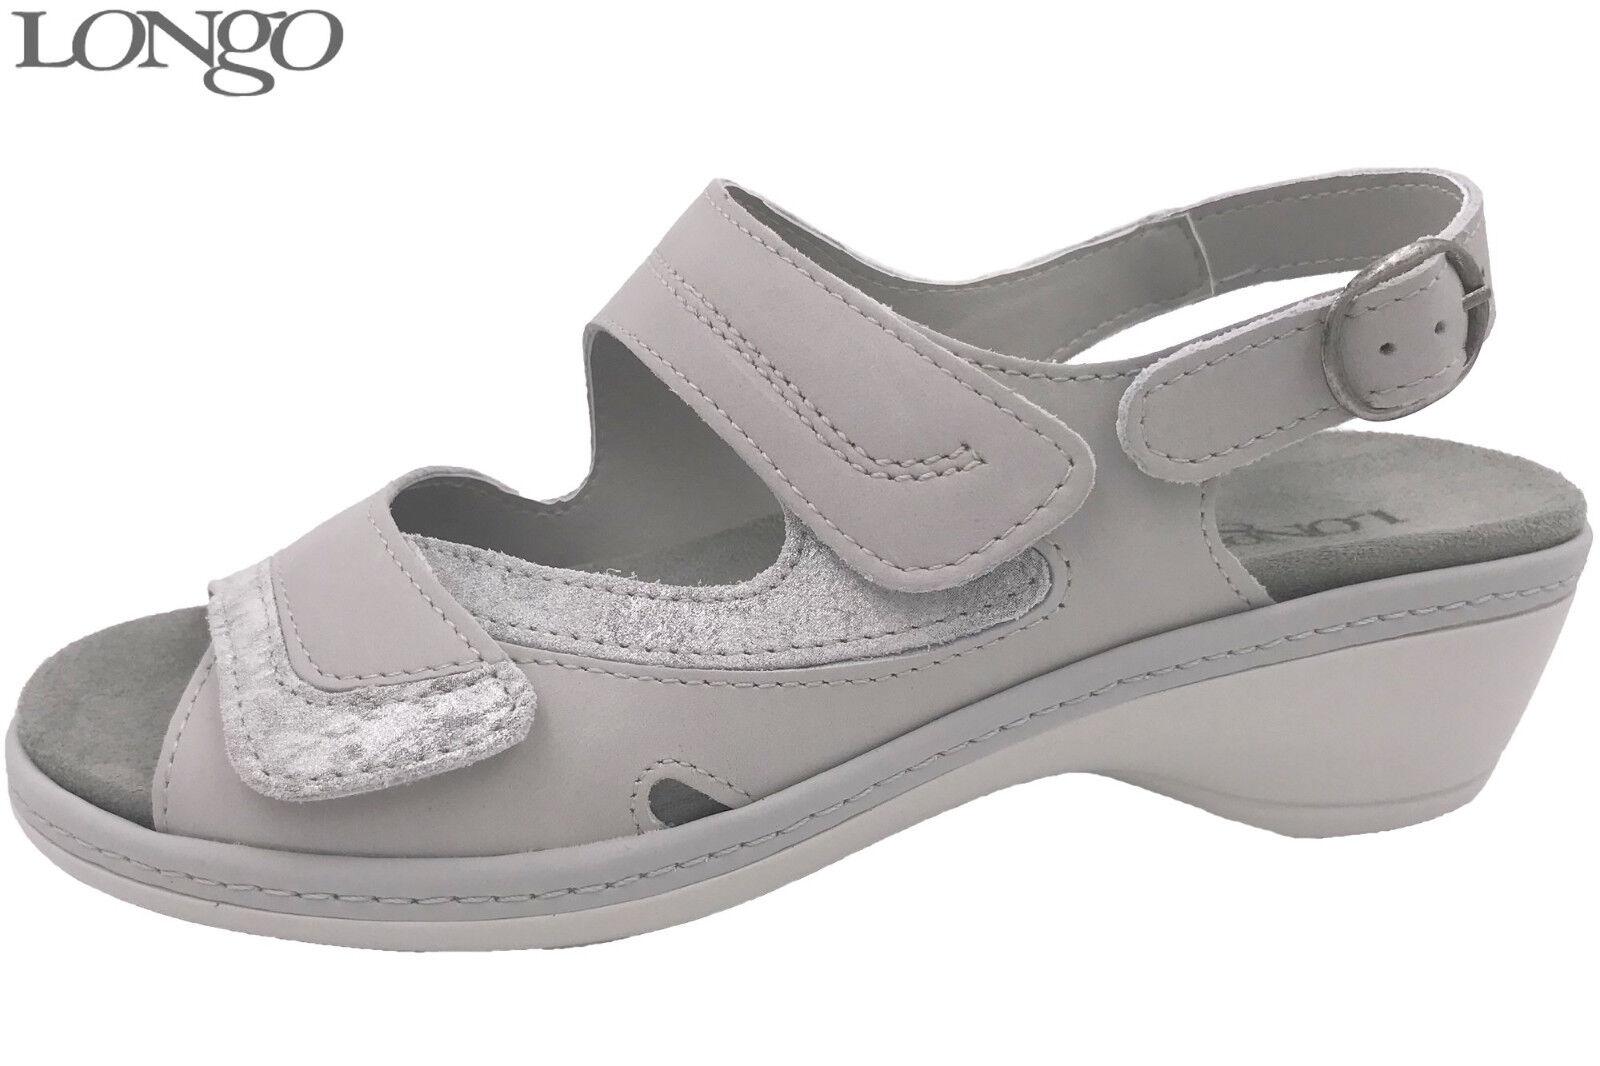 Longo Damen Sandalee Grau Leder Sandaleette Sommer Schuhe bequem 1006414 NEU